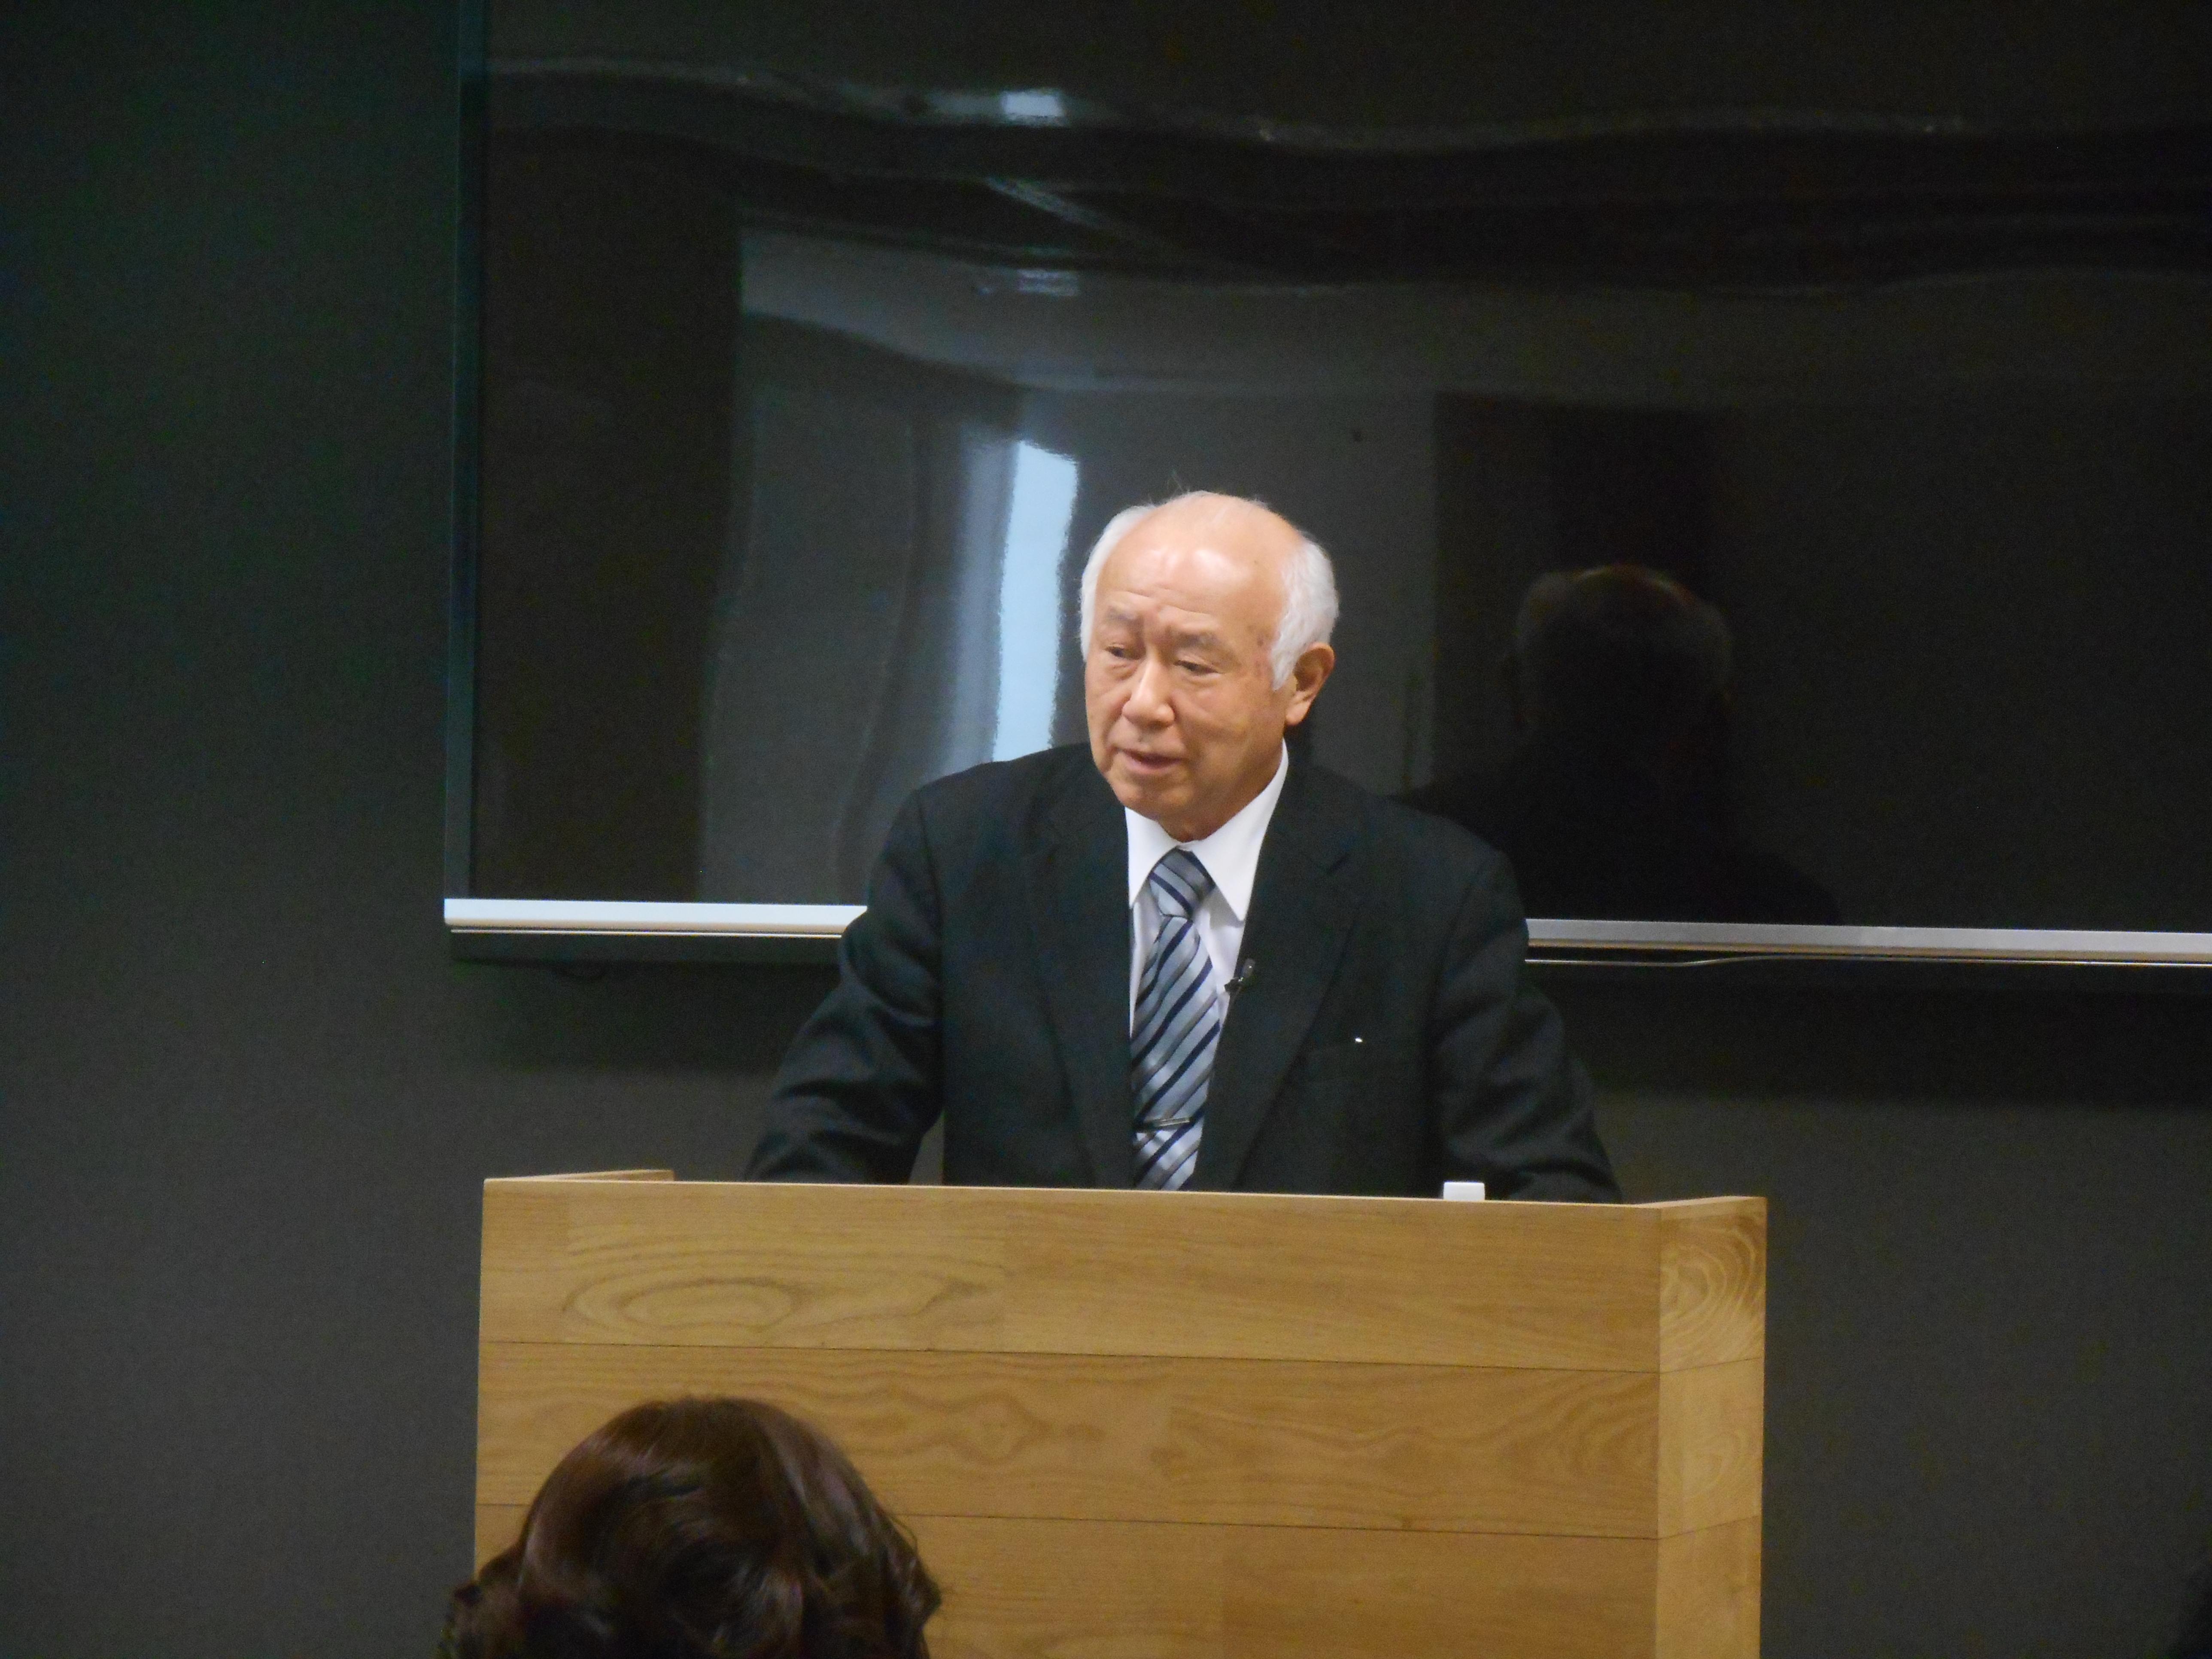 DSCN0424 1 - 平成30年度 東京思風塾 4月7日(土)「時代が問題をつくり、問題が人物をつくる」